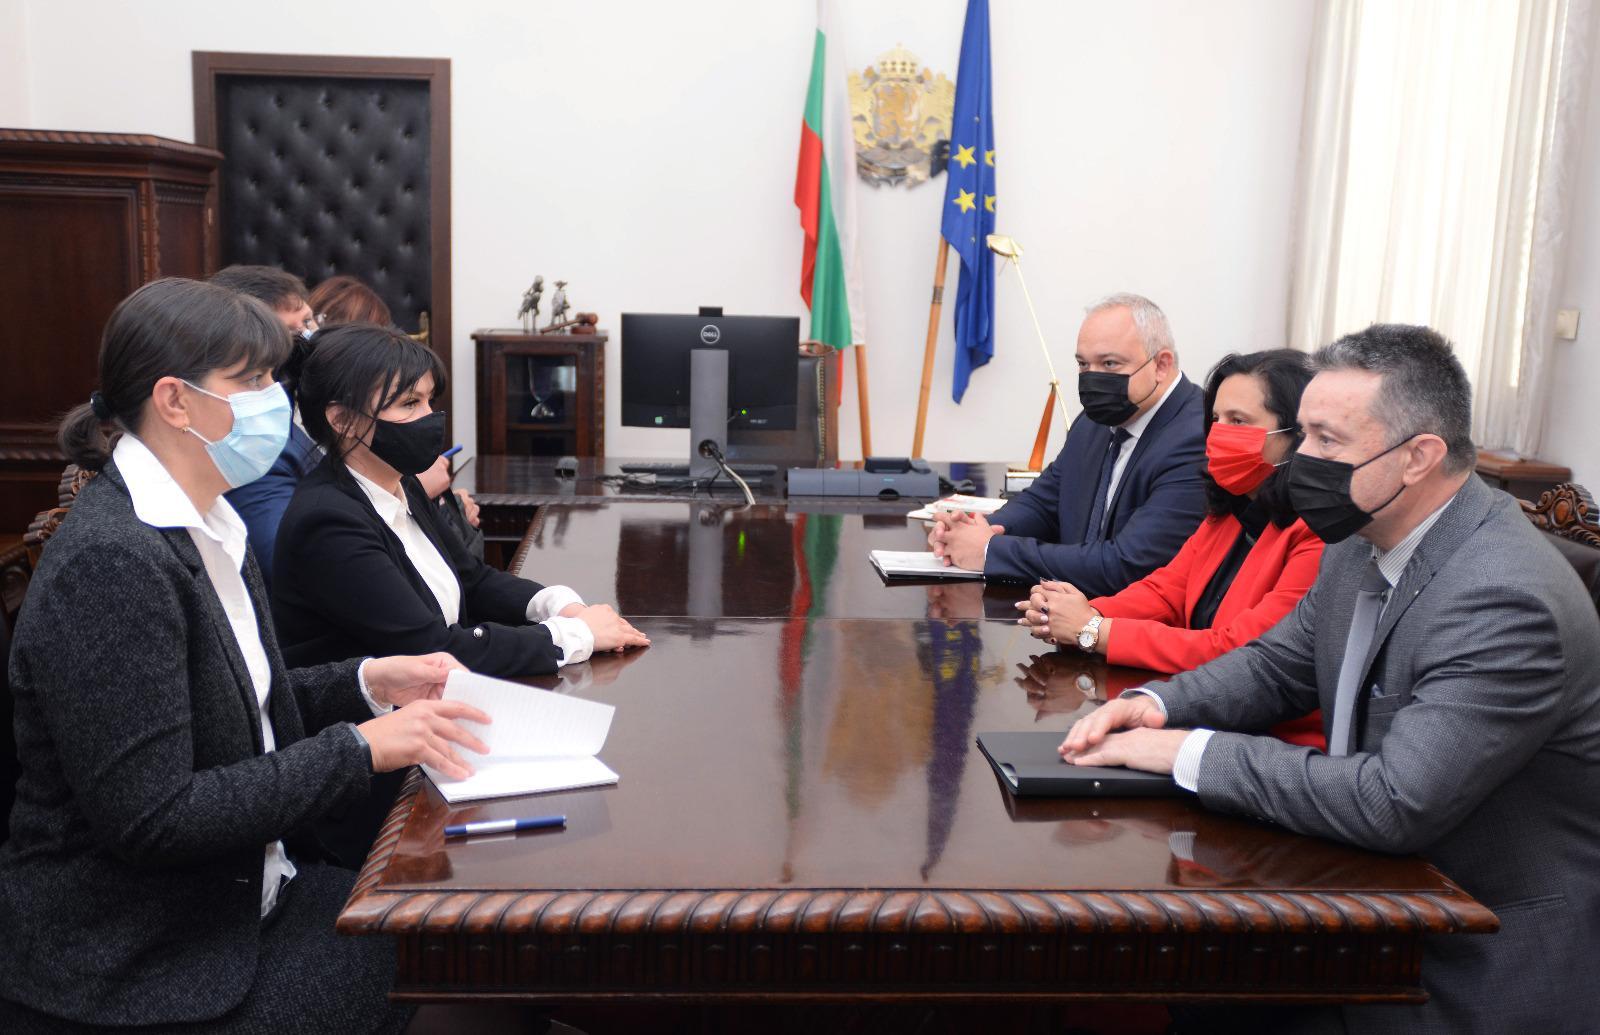 Лаура Кьовеши, Министър на правосъдието, главен прокурор, Иван Гешев, Янаки Стоилов